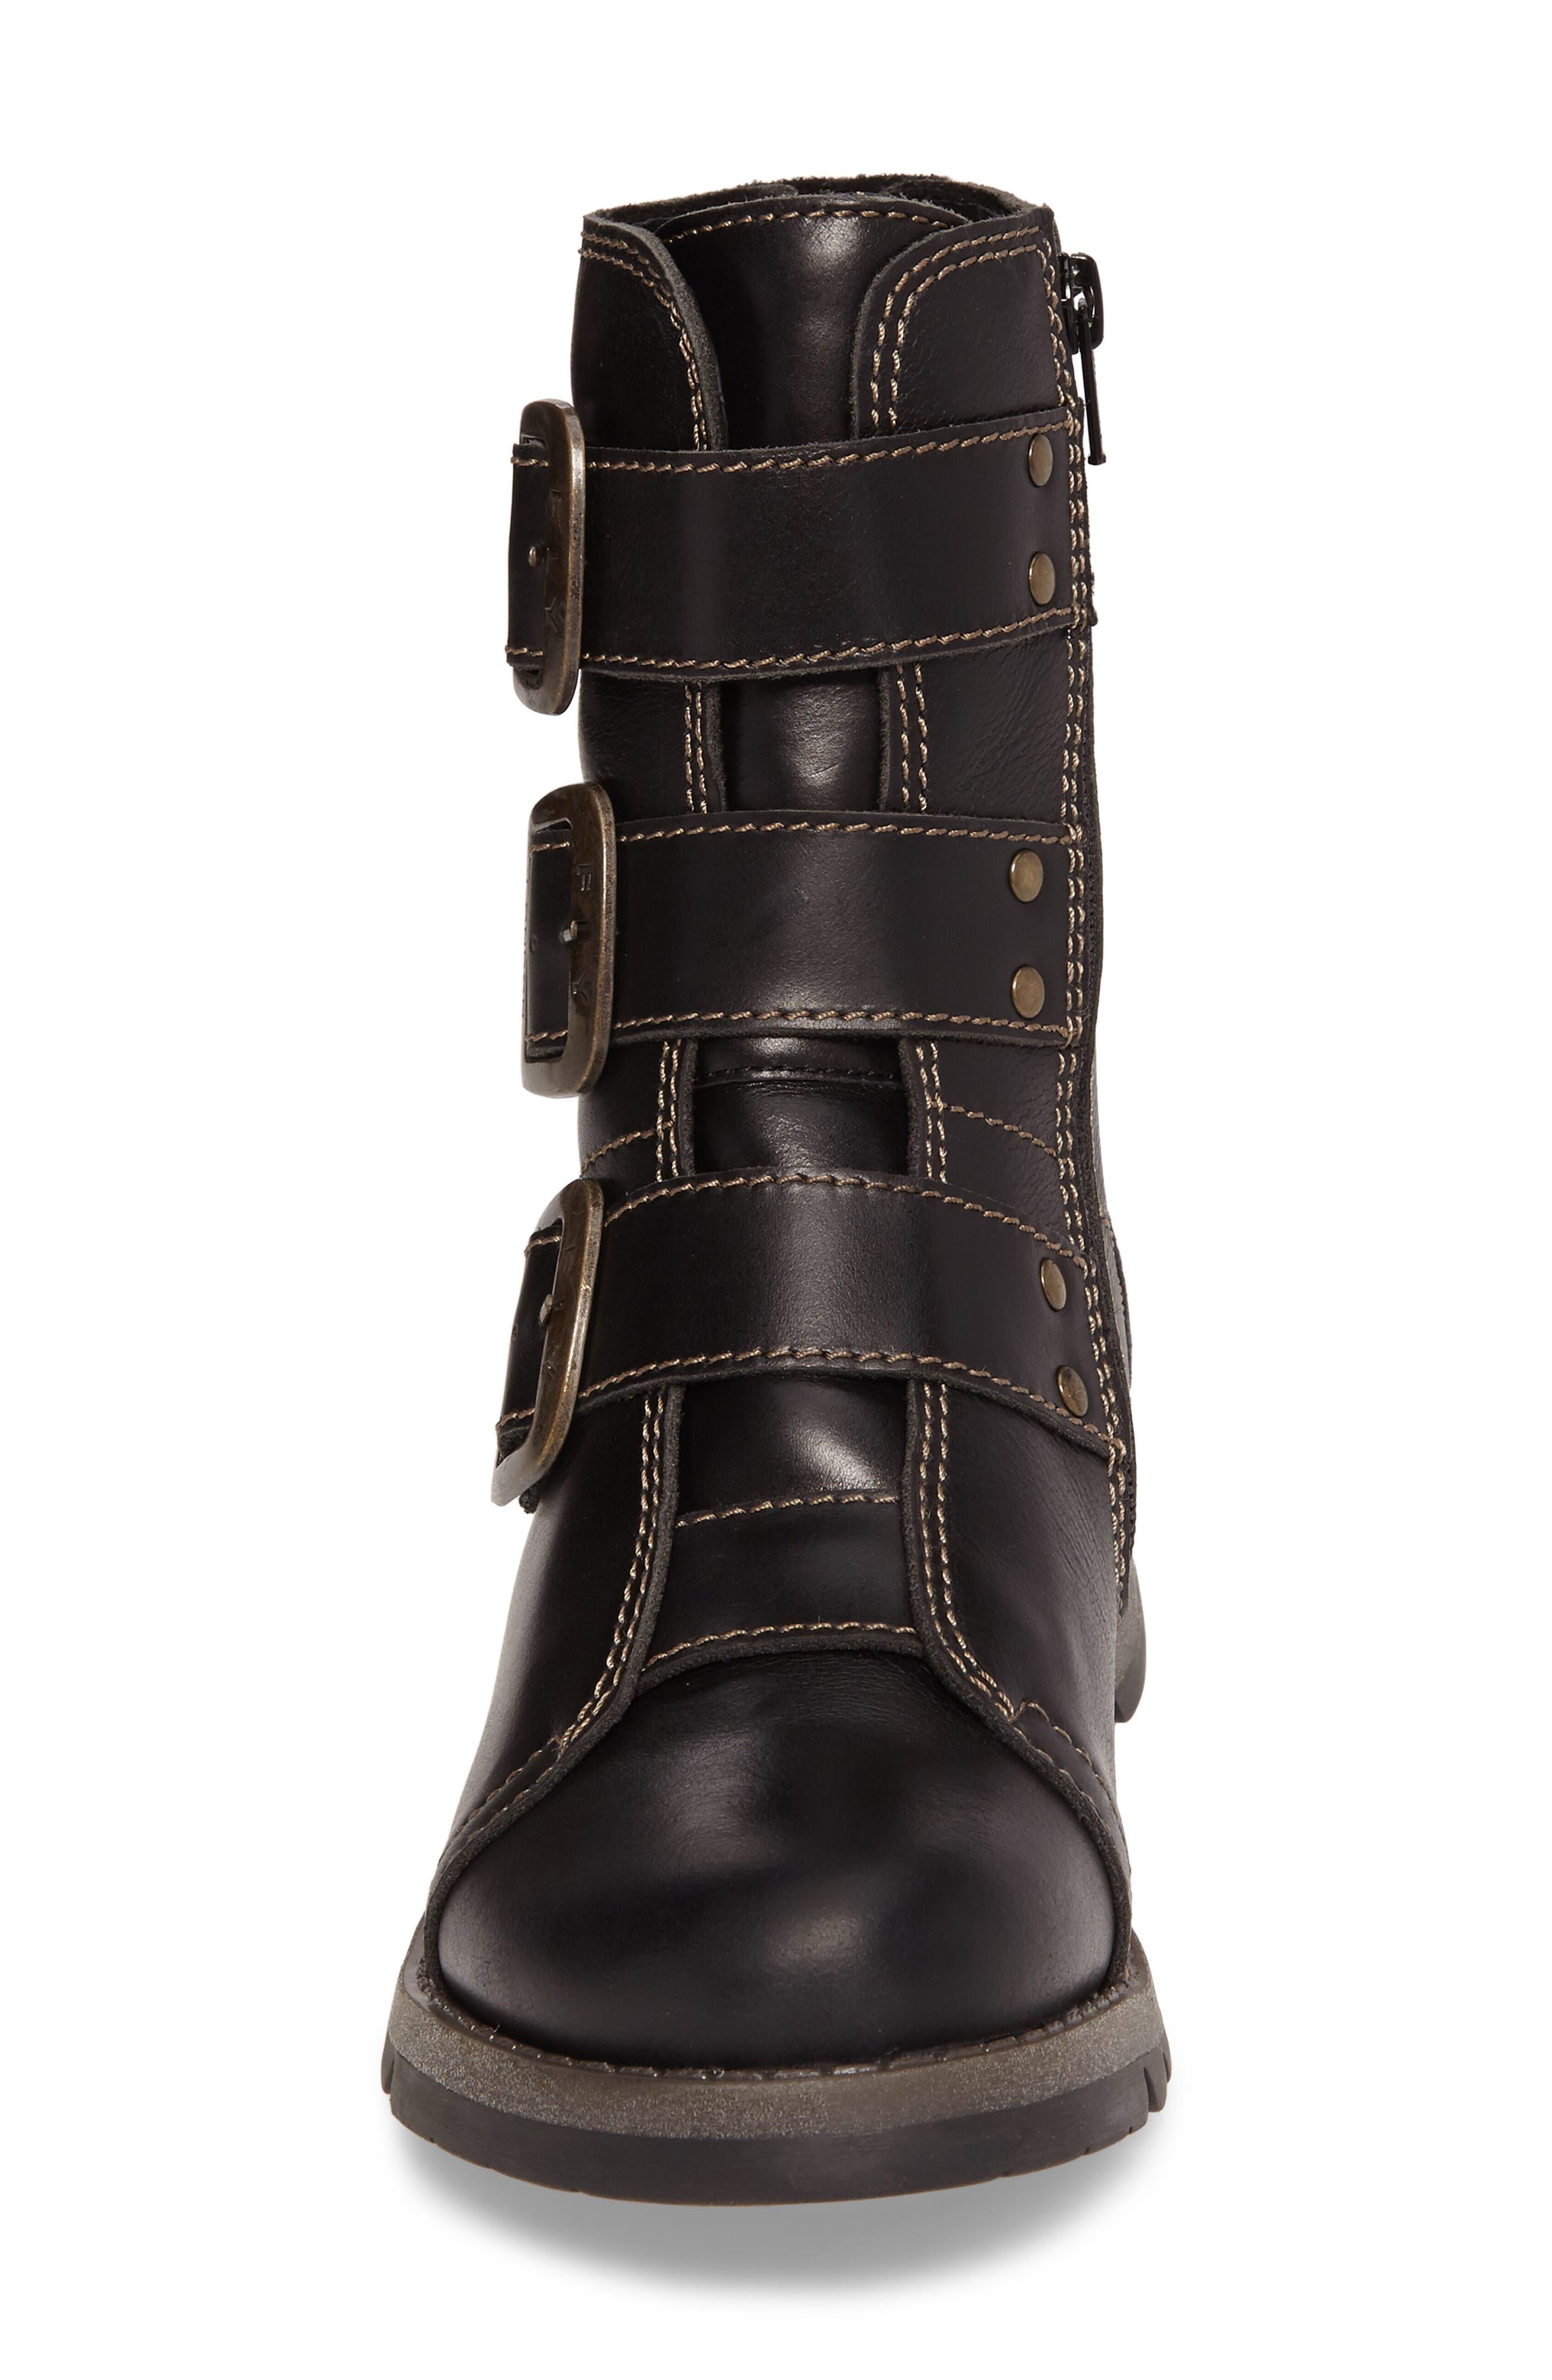 Scop Boot,                             Alternate thumbnail 4, color,                             Black Leather